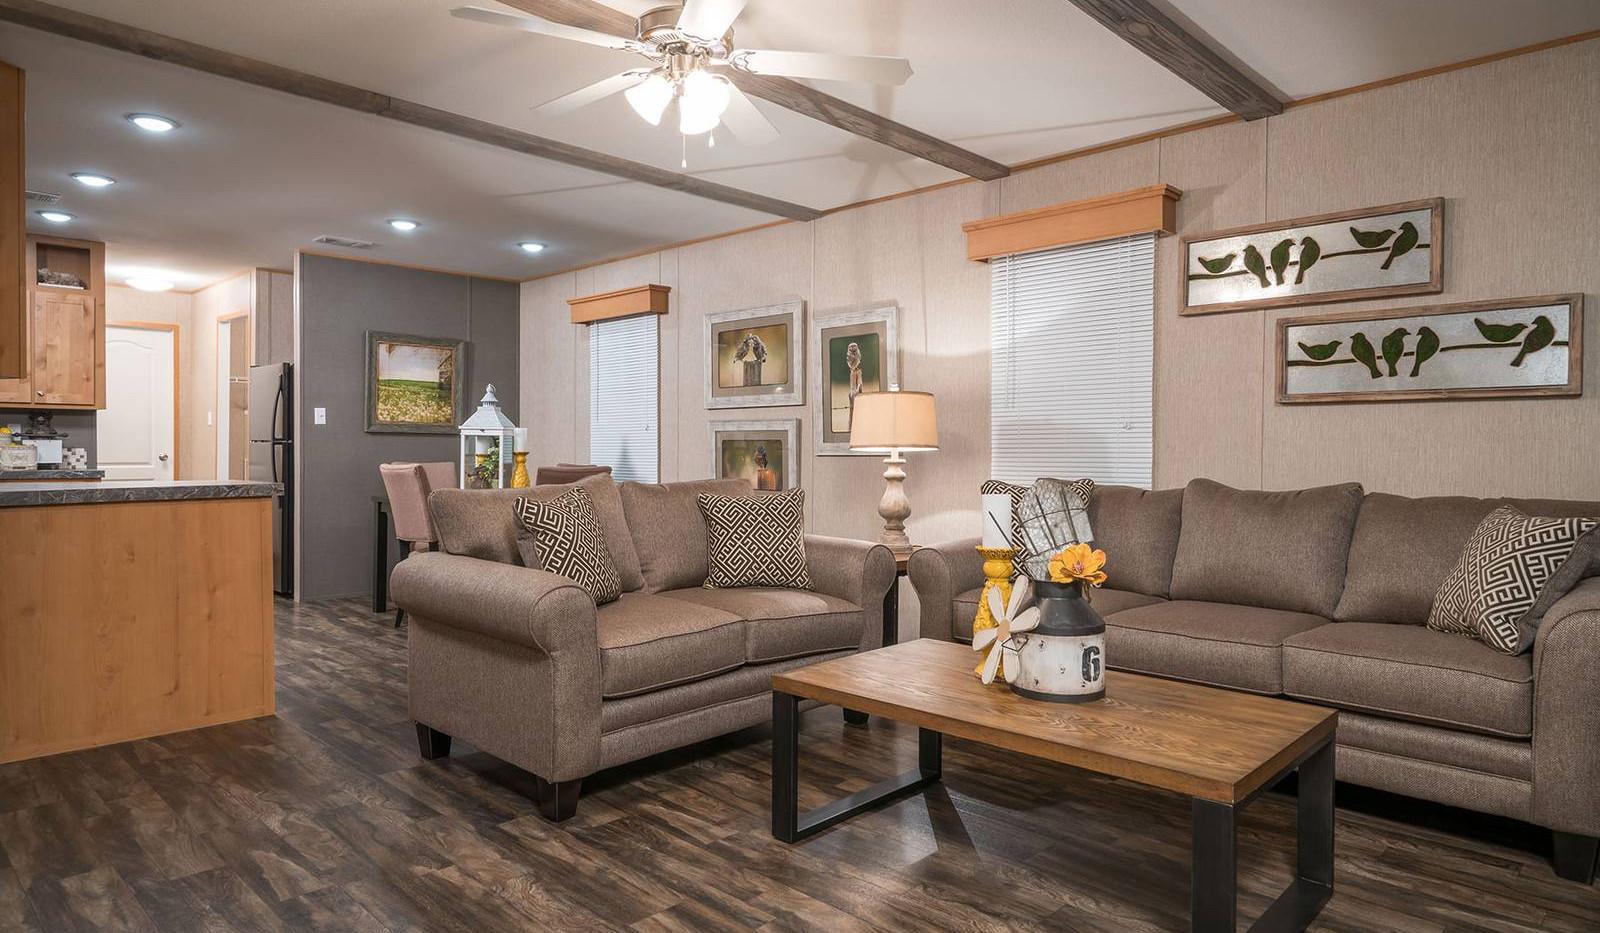 5-select-1676c-living-room-2-1600x1068.j